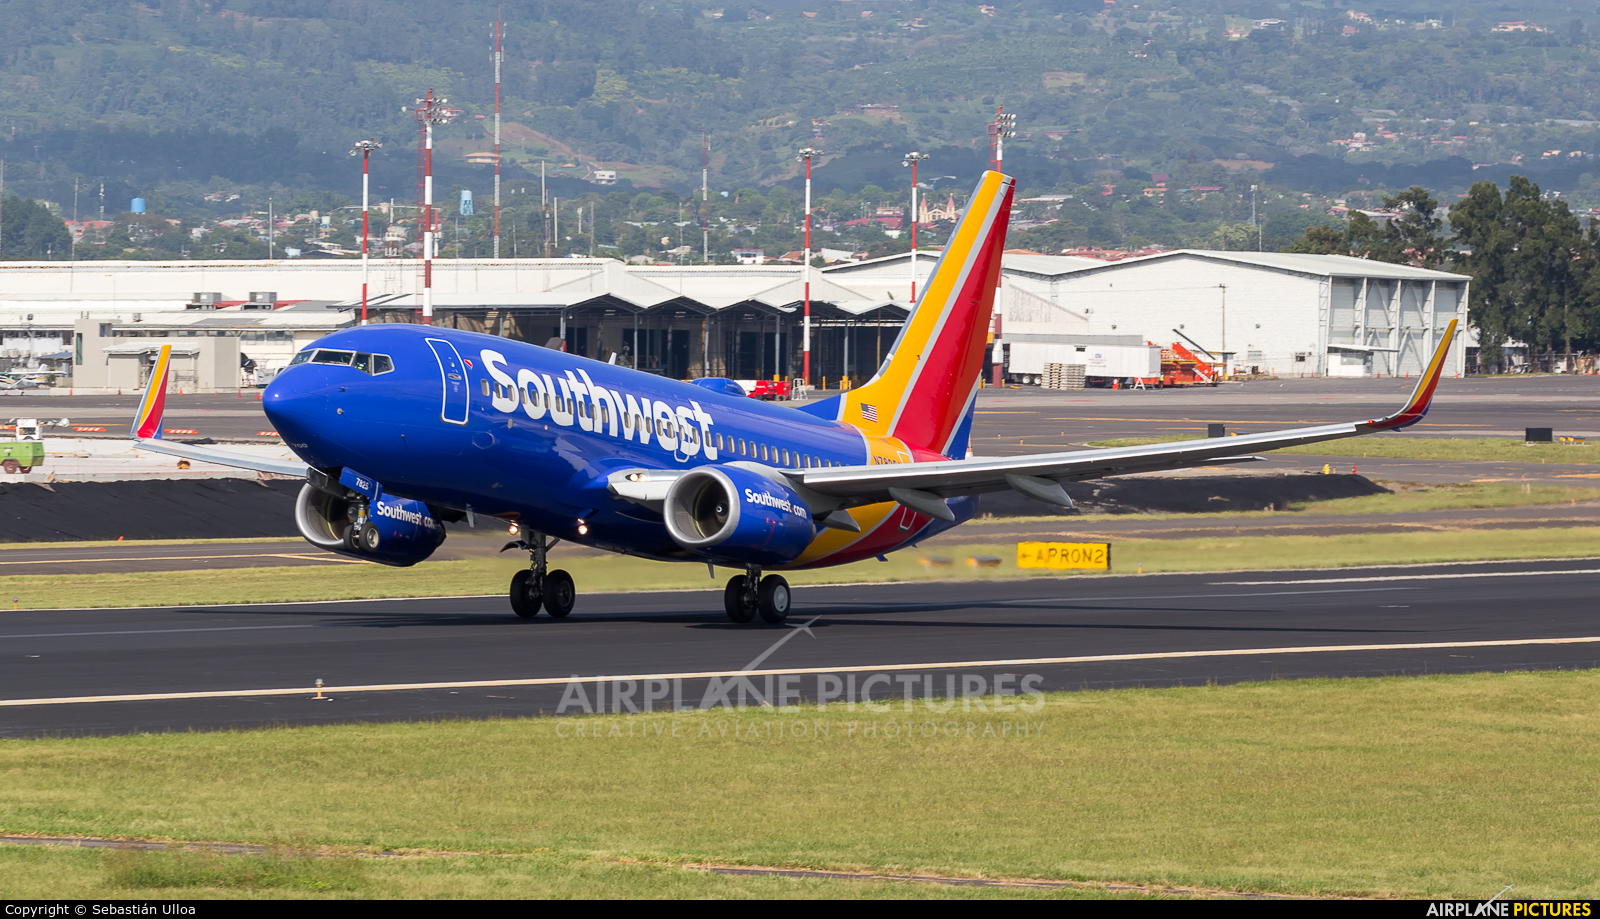 Southwest Airlines N7825A aircraft at San Jose - Juan Santamaría Intl